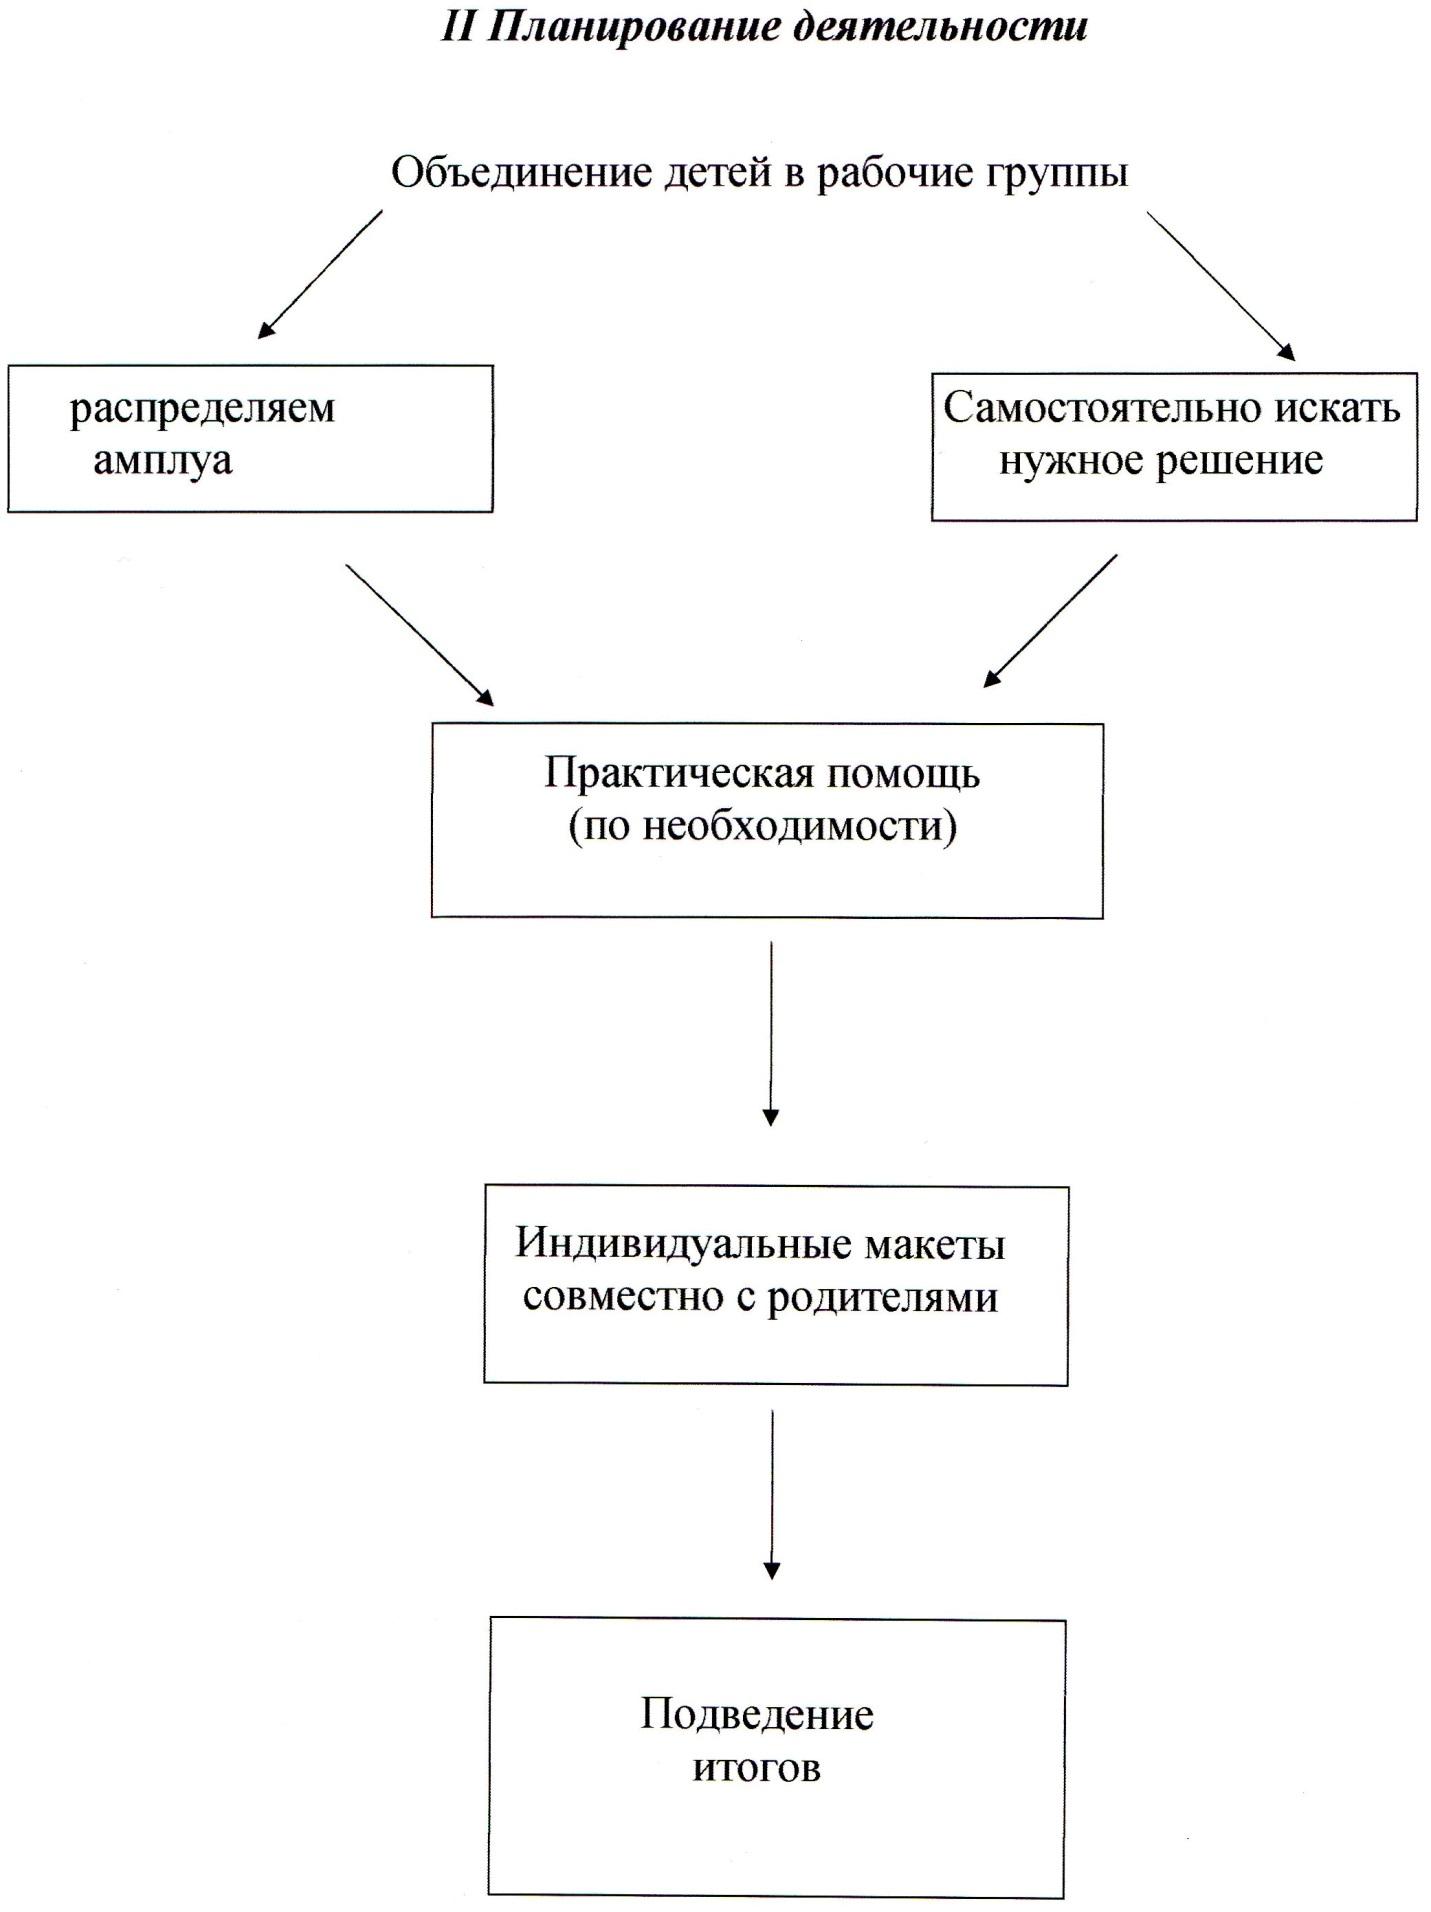 C:\Users\123\Desktop\проект Принько Т.И\img031.jpg